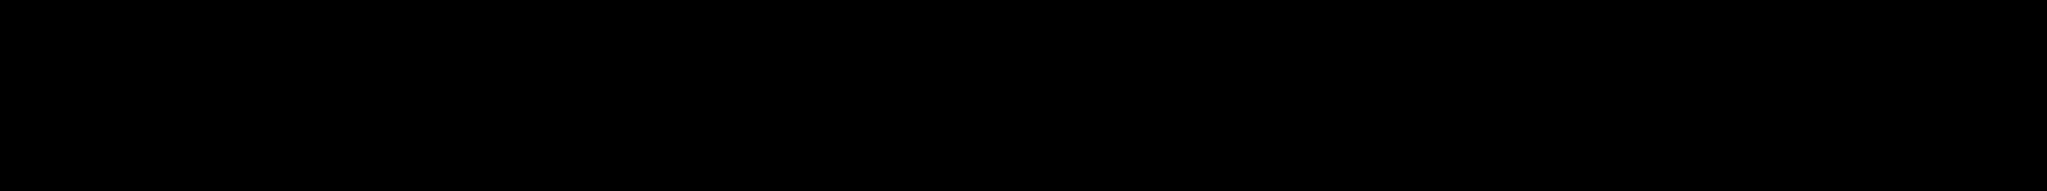 Design System F 900R